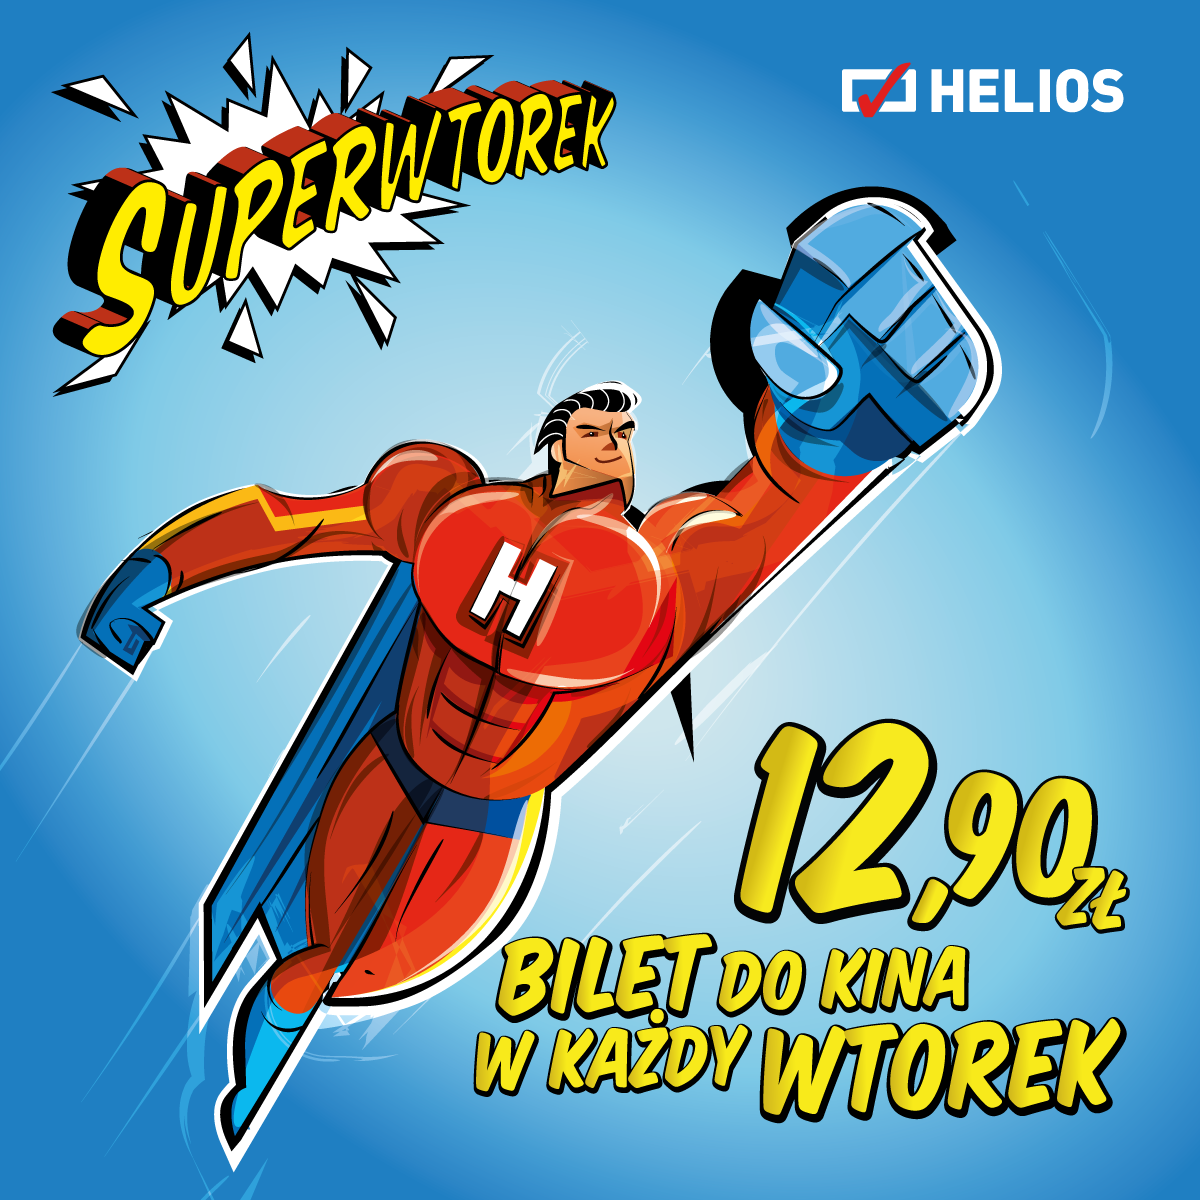 helios_superwtorek_12,90_202106_1200x1200px_v1